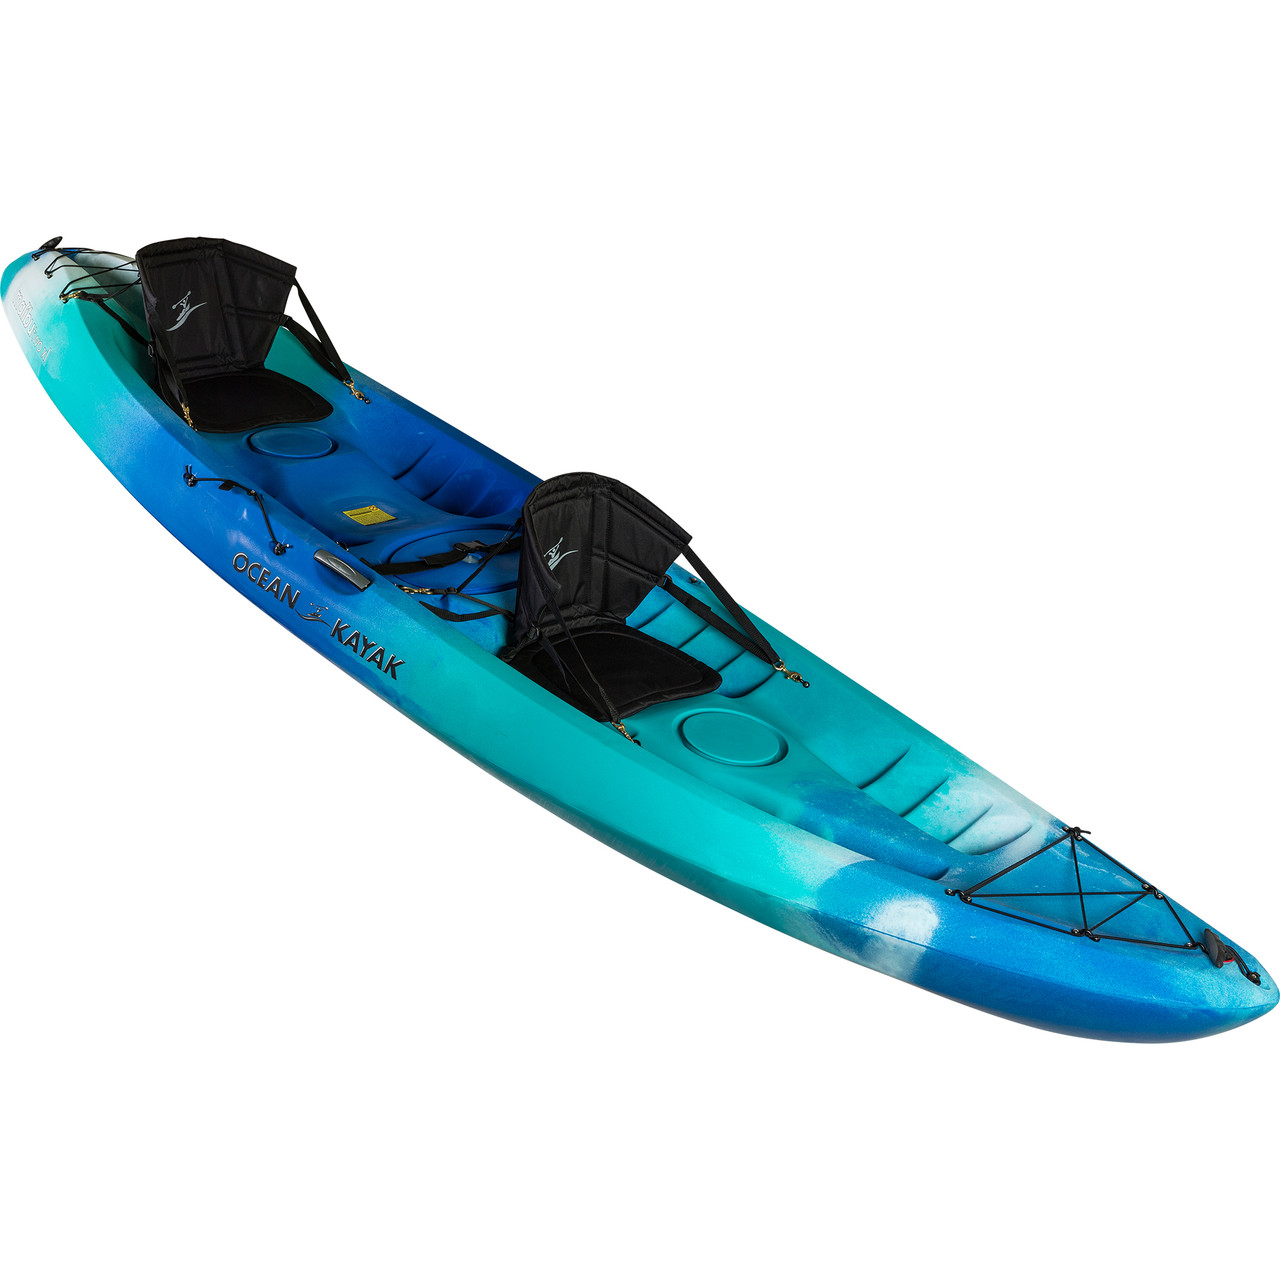 Ocean Kayak Malibu Two XL Seaglass